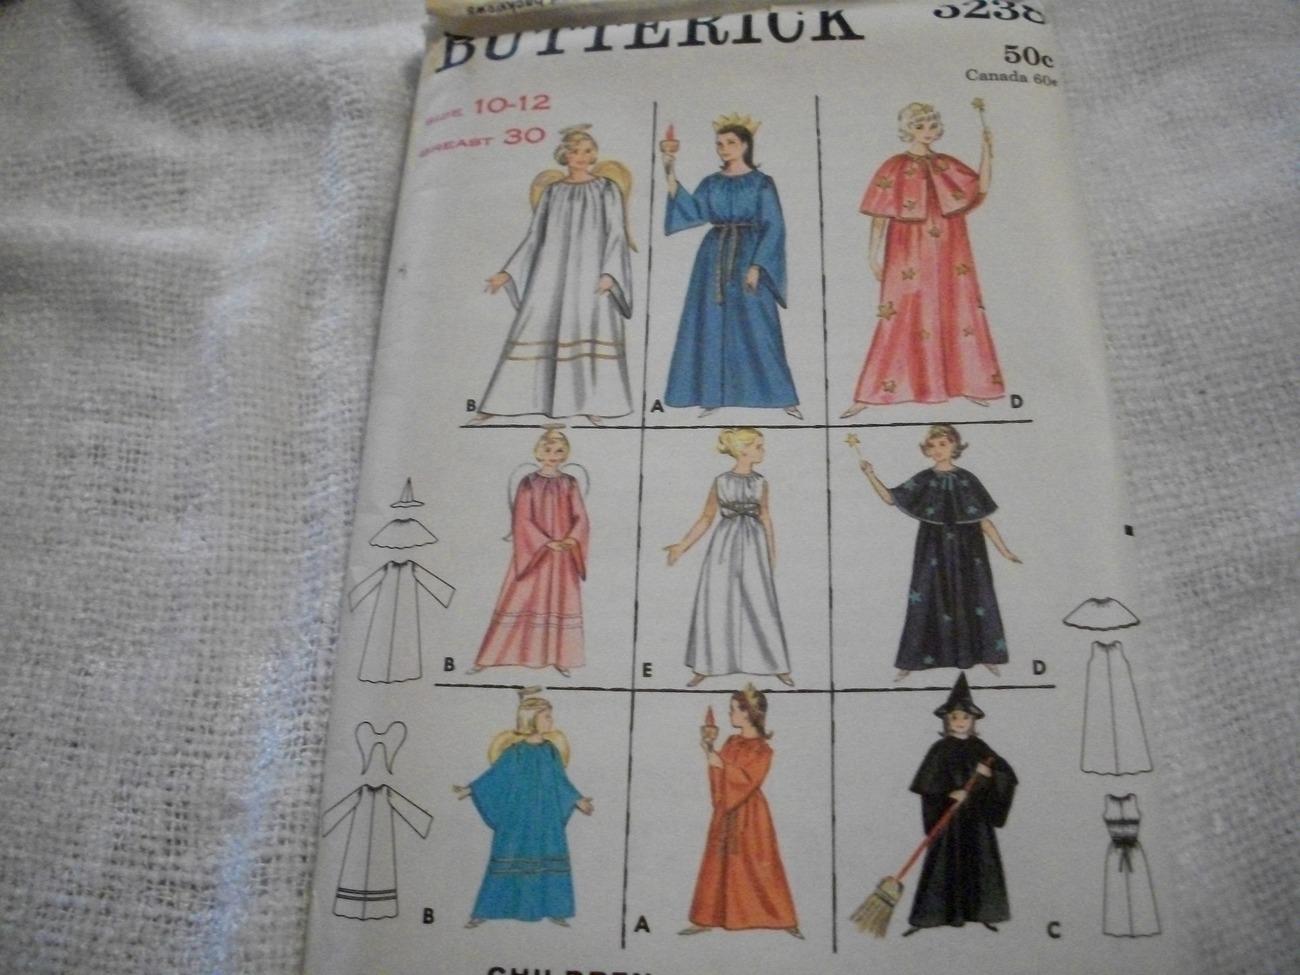 Vintage Woman's Costume Pattern Butterick 3238